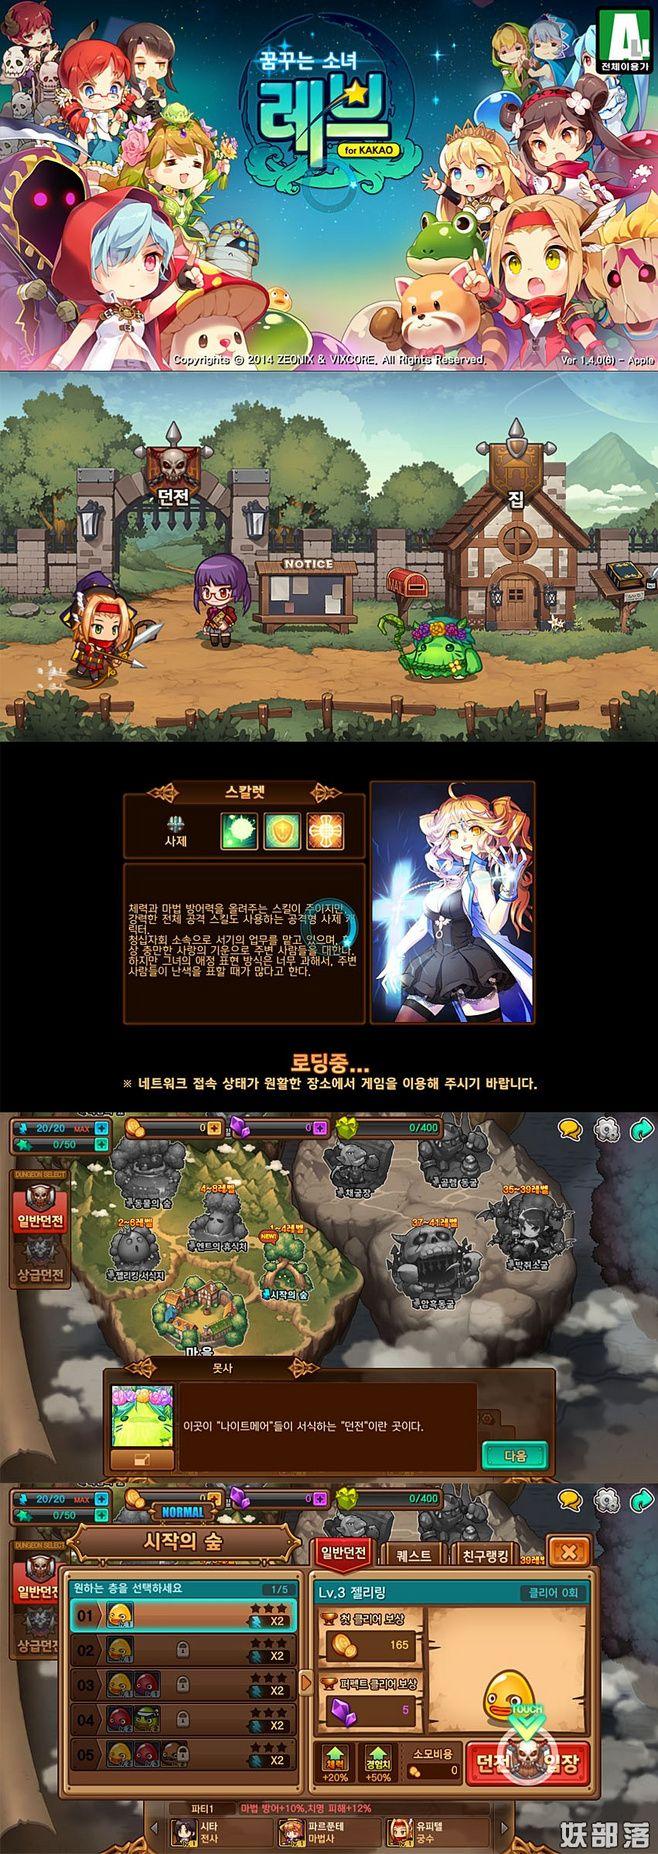 Reve-做梦少女for kakao -...@阿银爱设计采集到Game.ui.phone(344图)_花瓣UI 交互设计